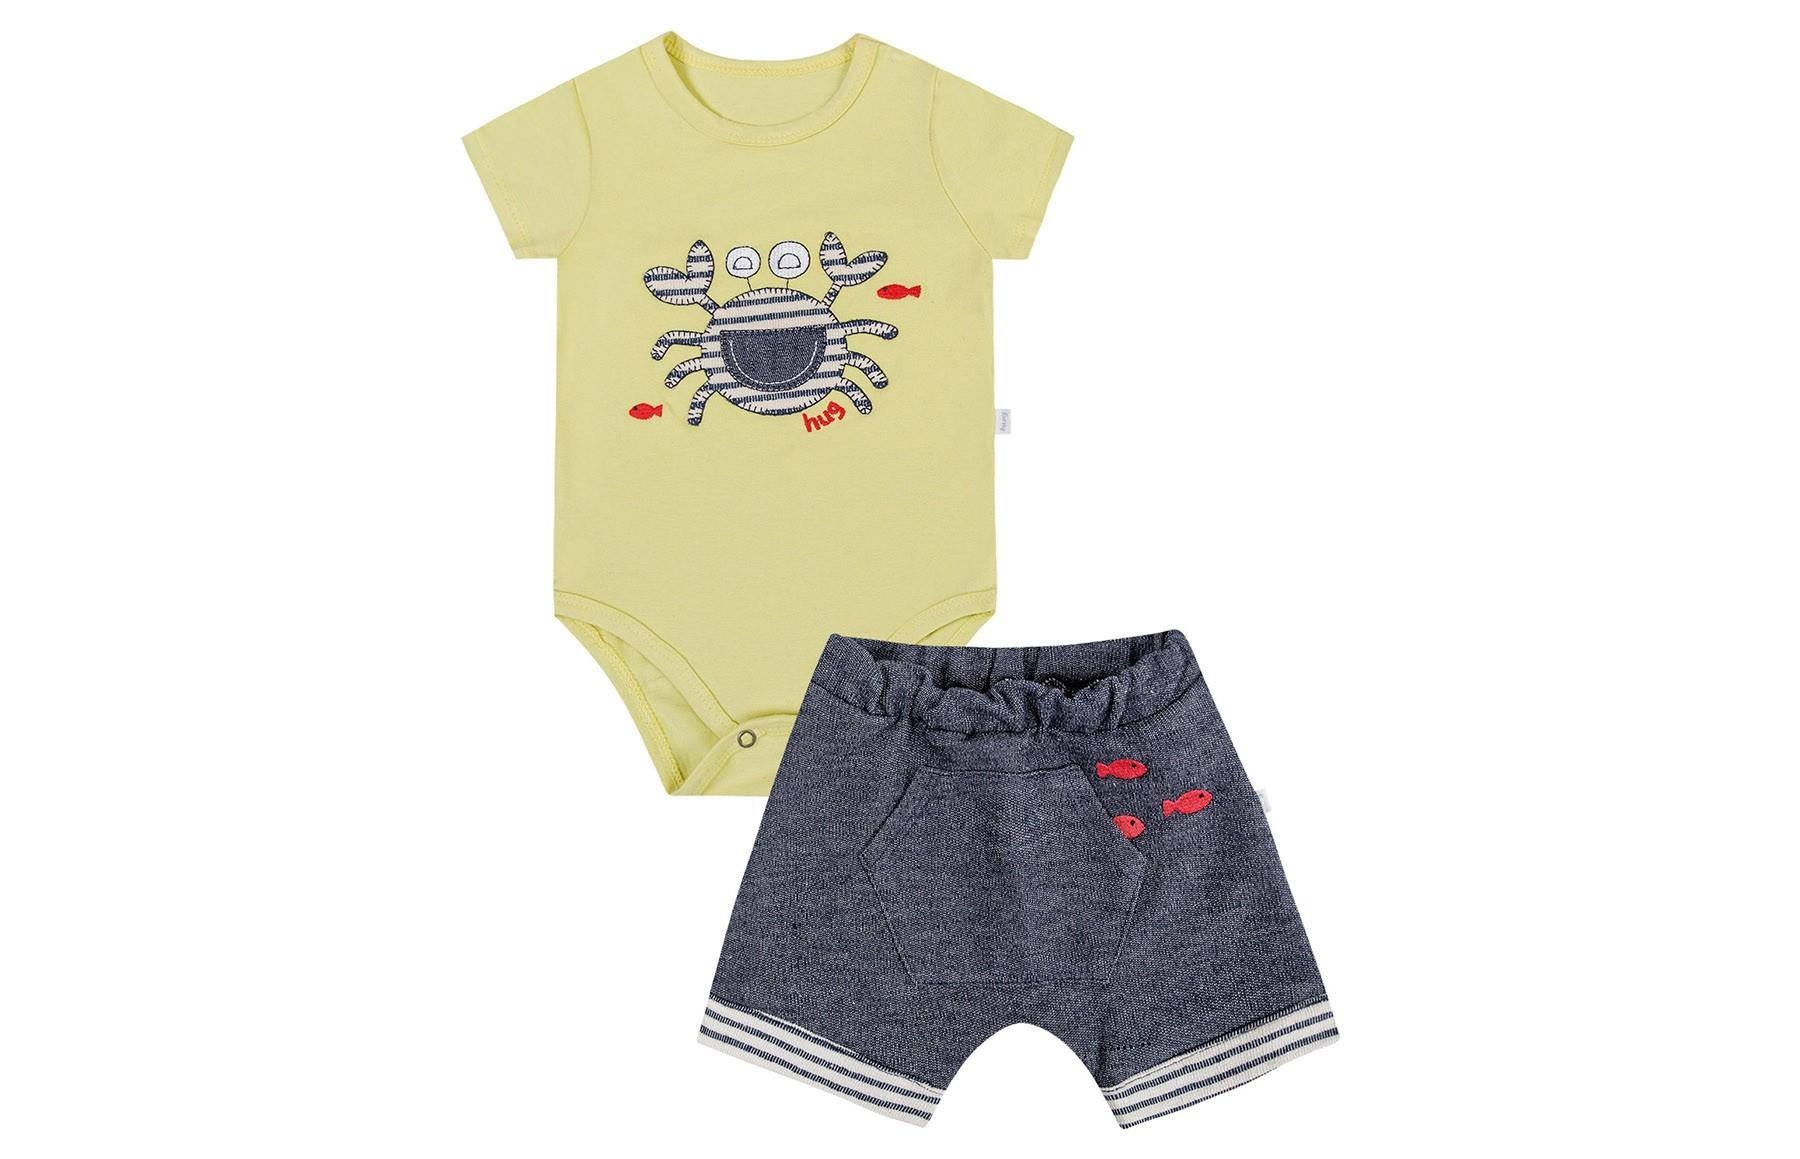 Conjunto Body mg Curta + Shorts - Amarelo